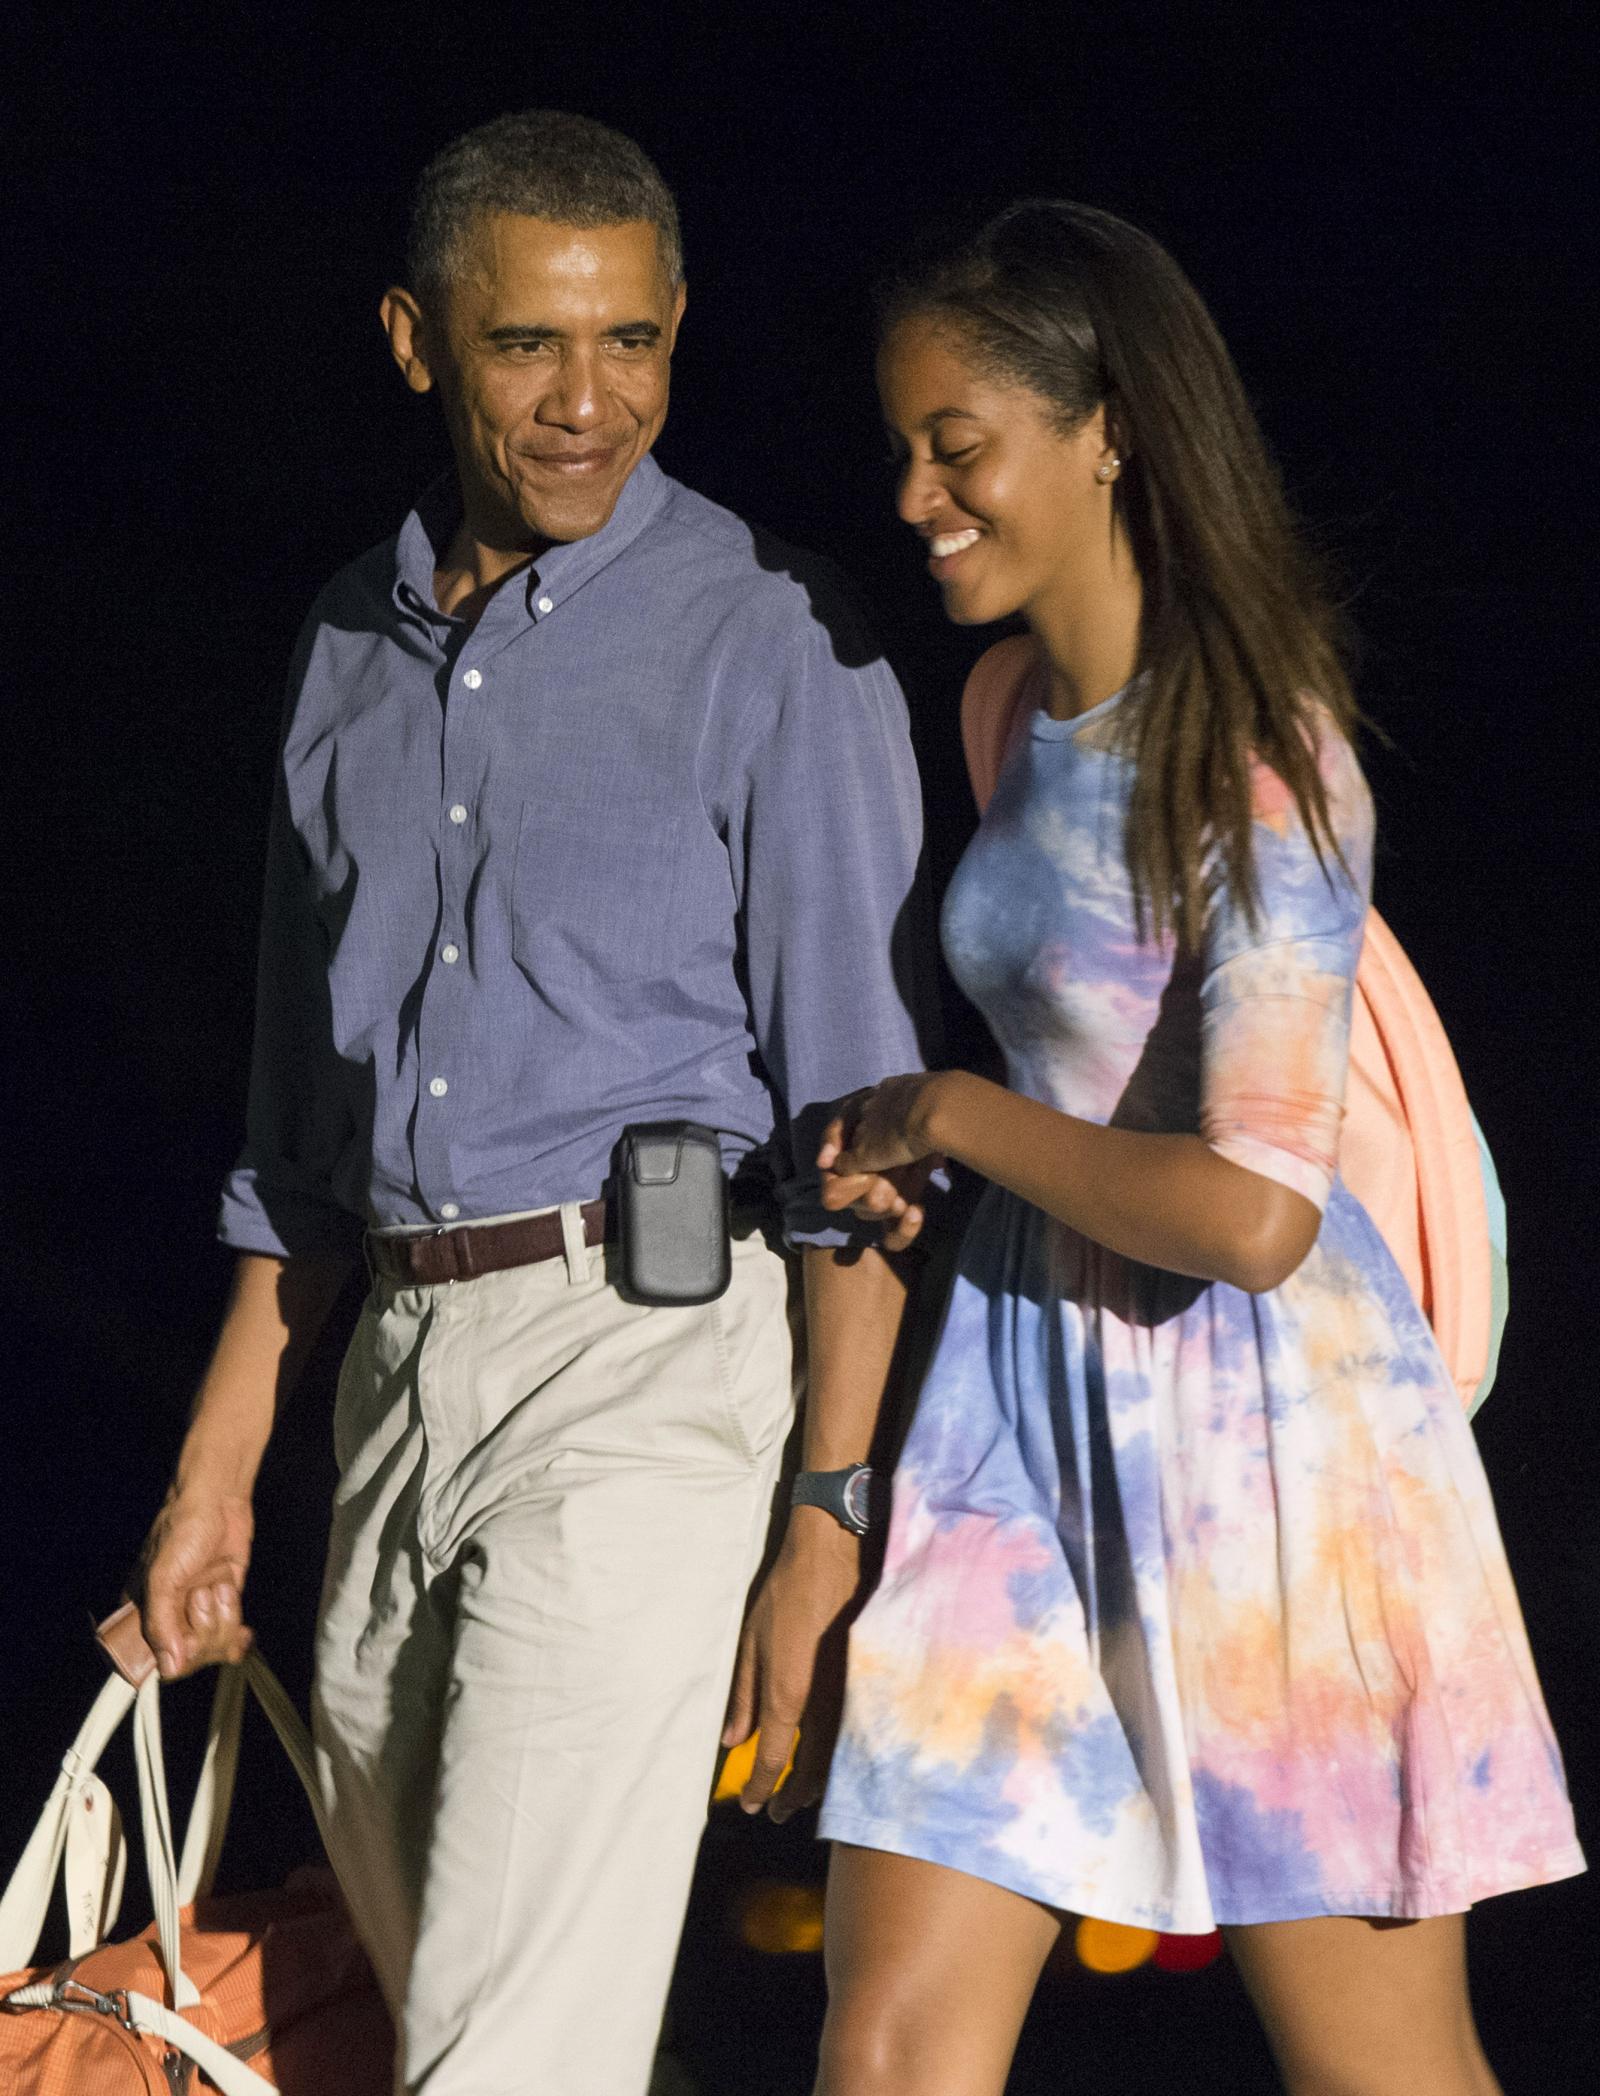 Is malia obama dating